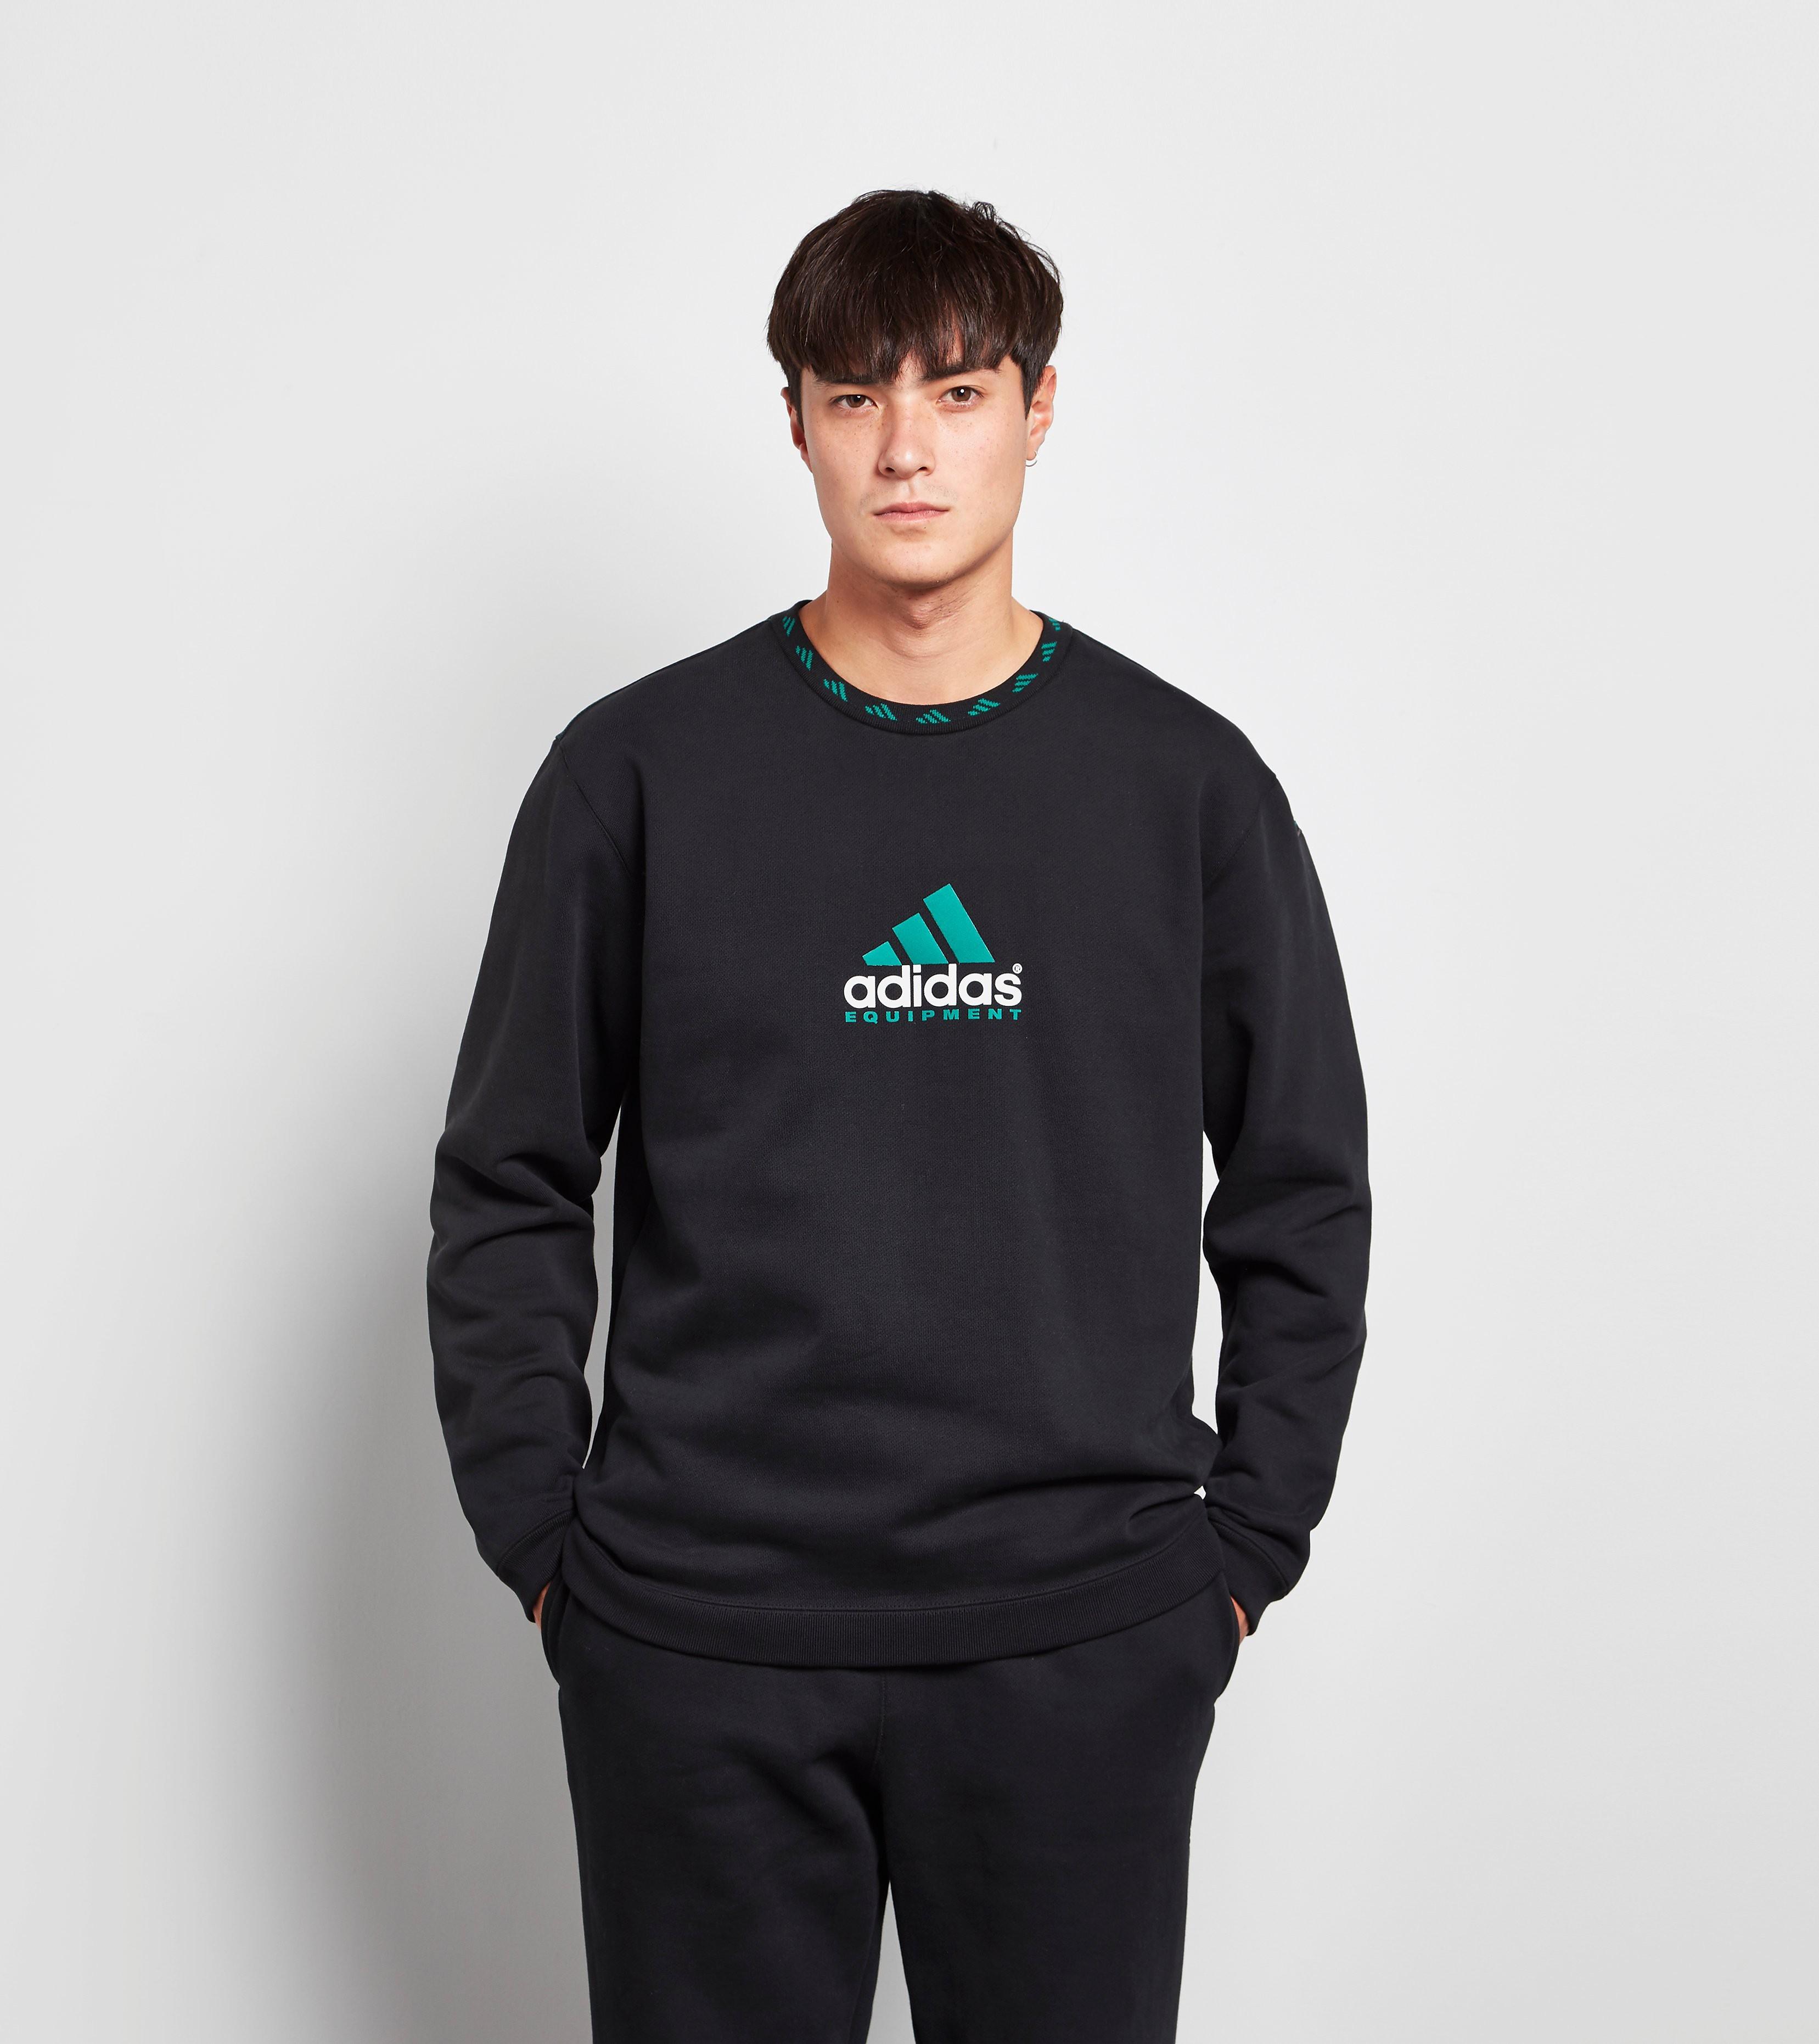 adidas EQT Crew Sweatshirt